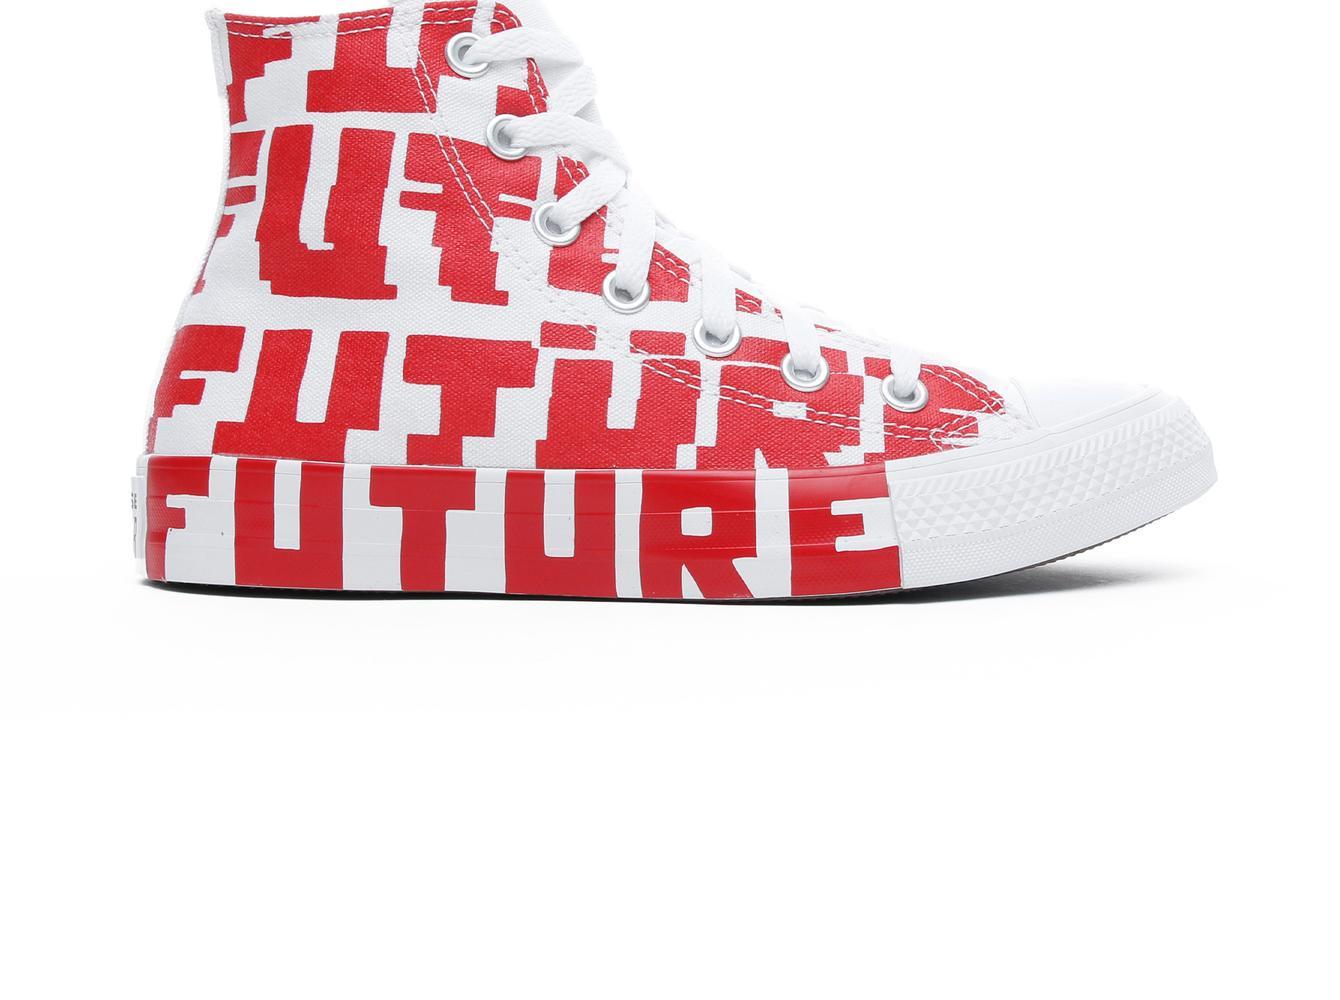 Chuck Taylor All Star Hi Unisex Sneaker